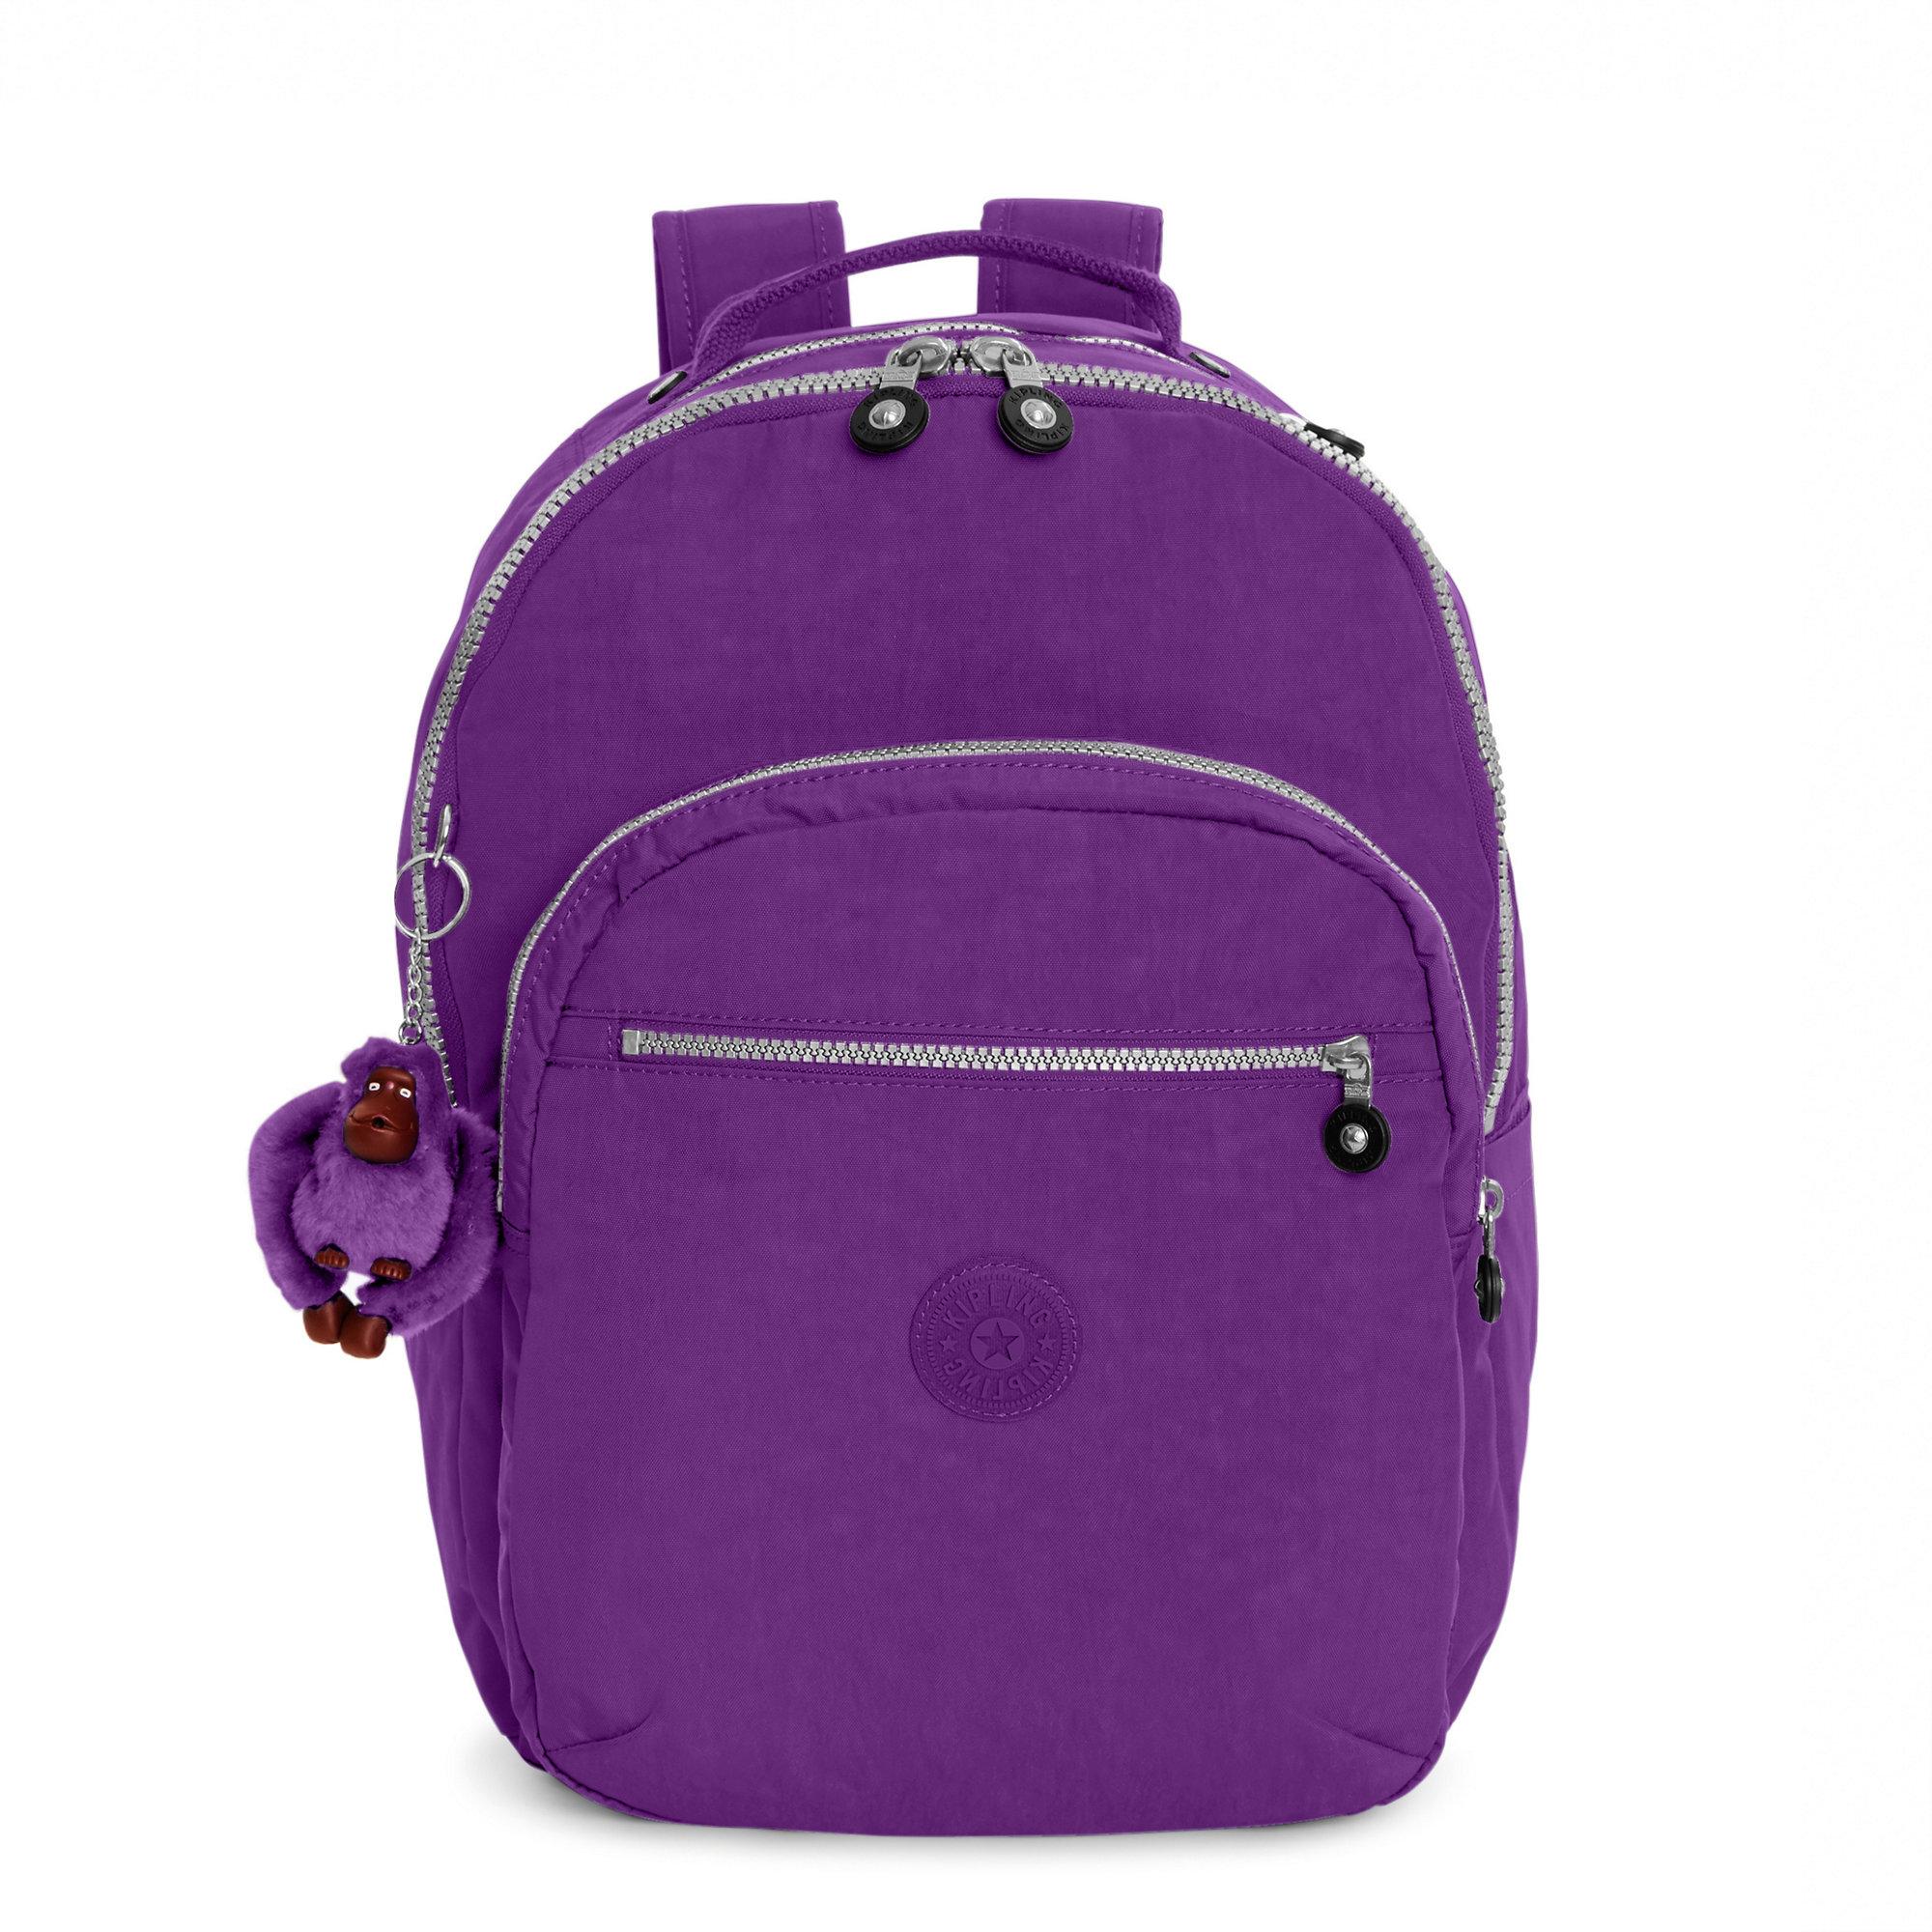 Kipling Seoul Large Laptop Backpack $26.4 (Org $114)